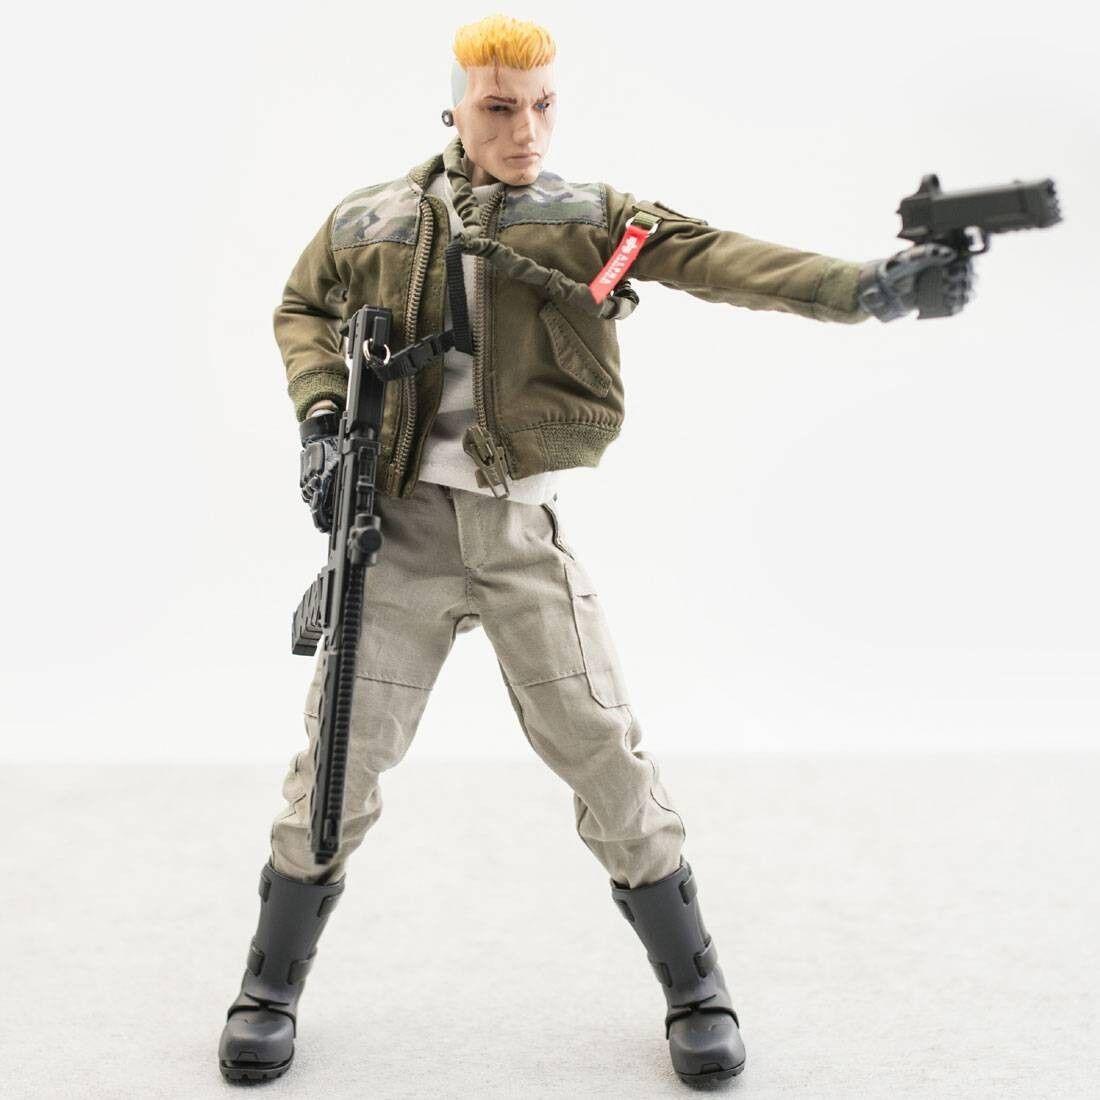 BAIT x G.I. Joe x 1000toys x Alpha Industries 1 6 Duke Figure - SDCC Exclusive (